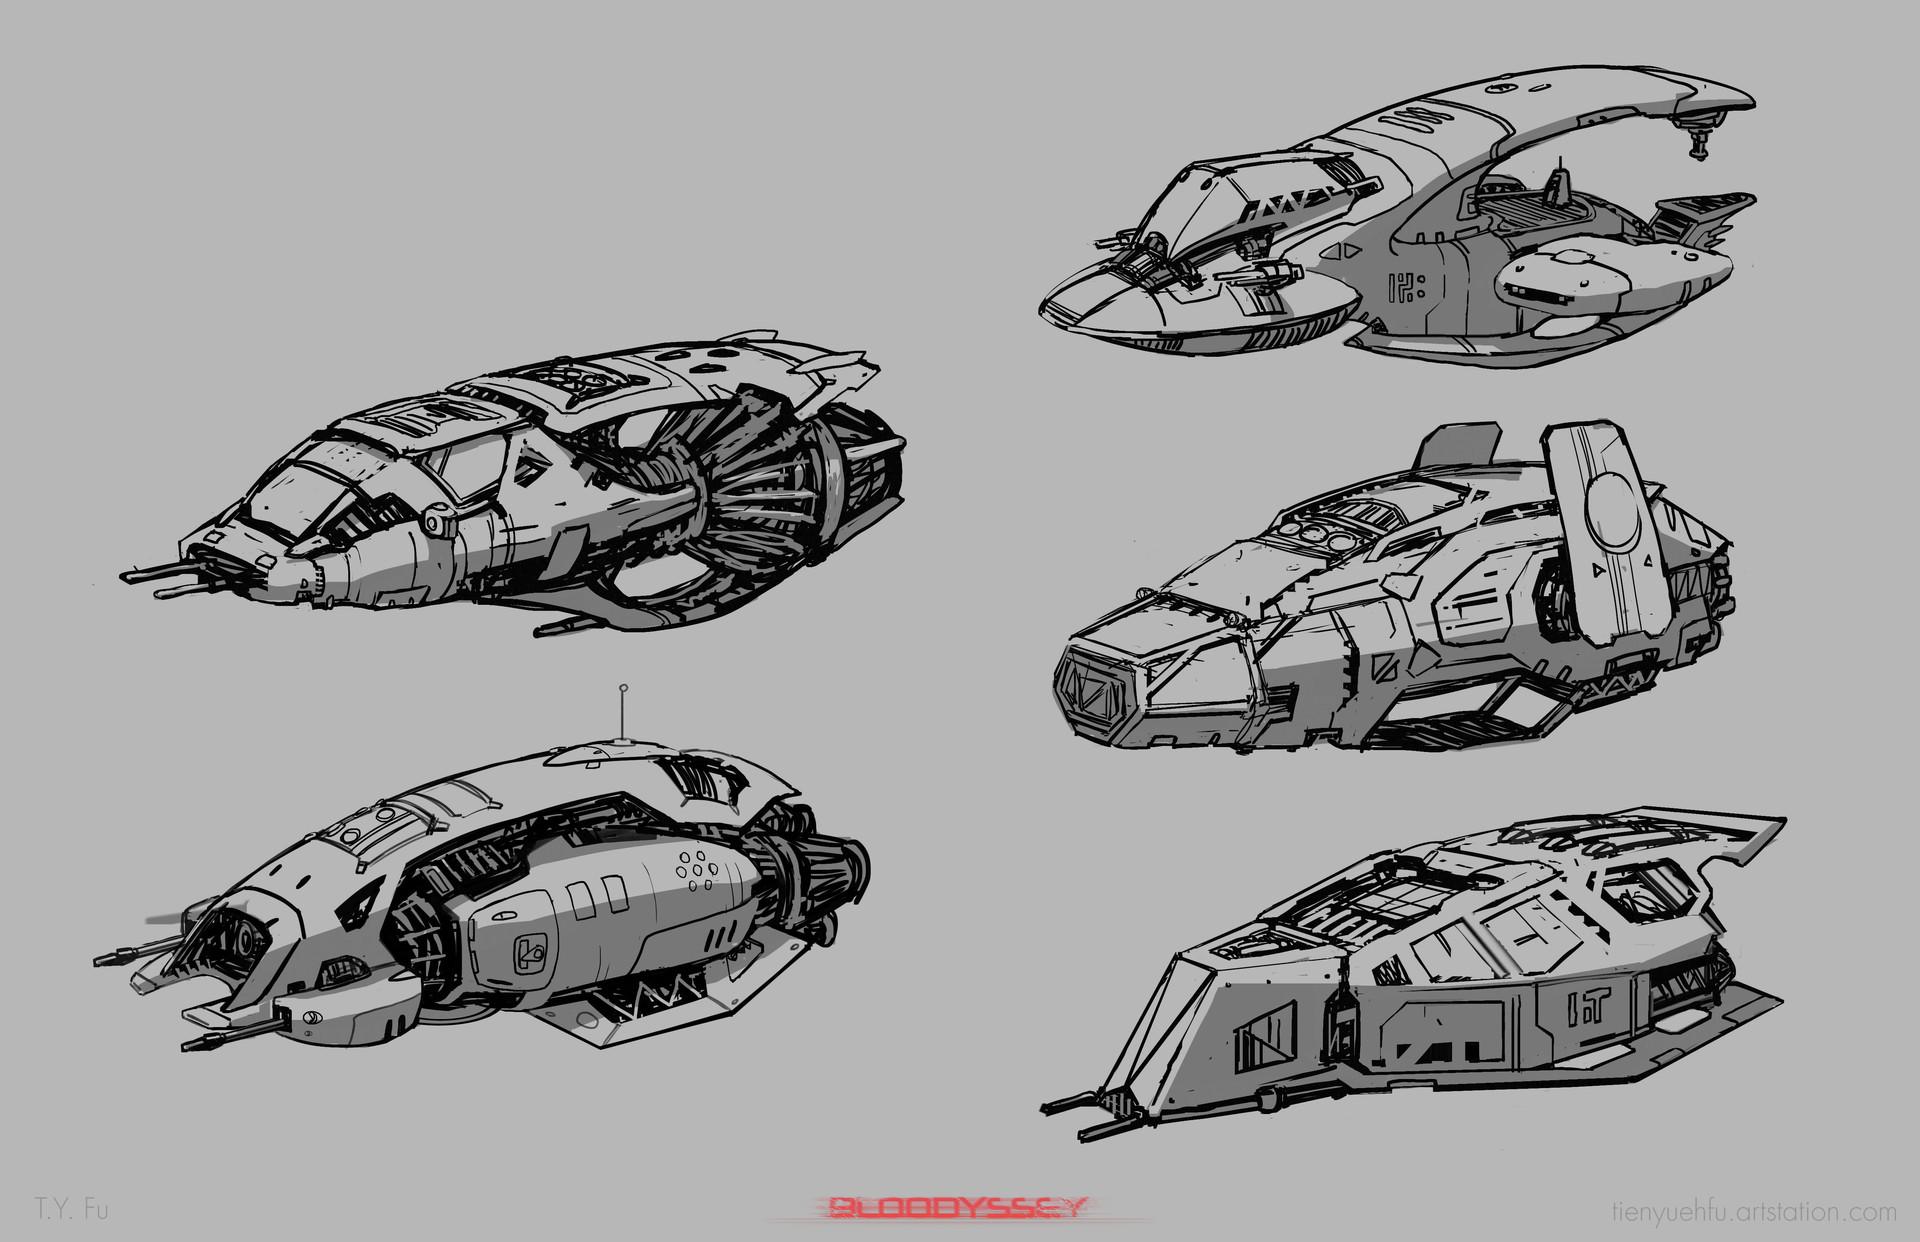 amazoncom blast spaceship sketches and renderings - HD1920×1242